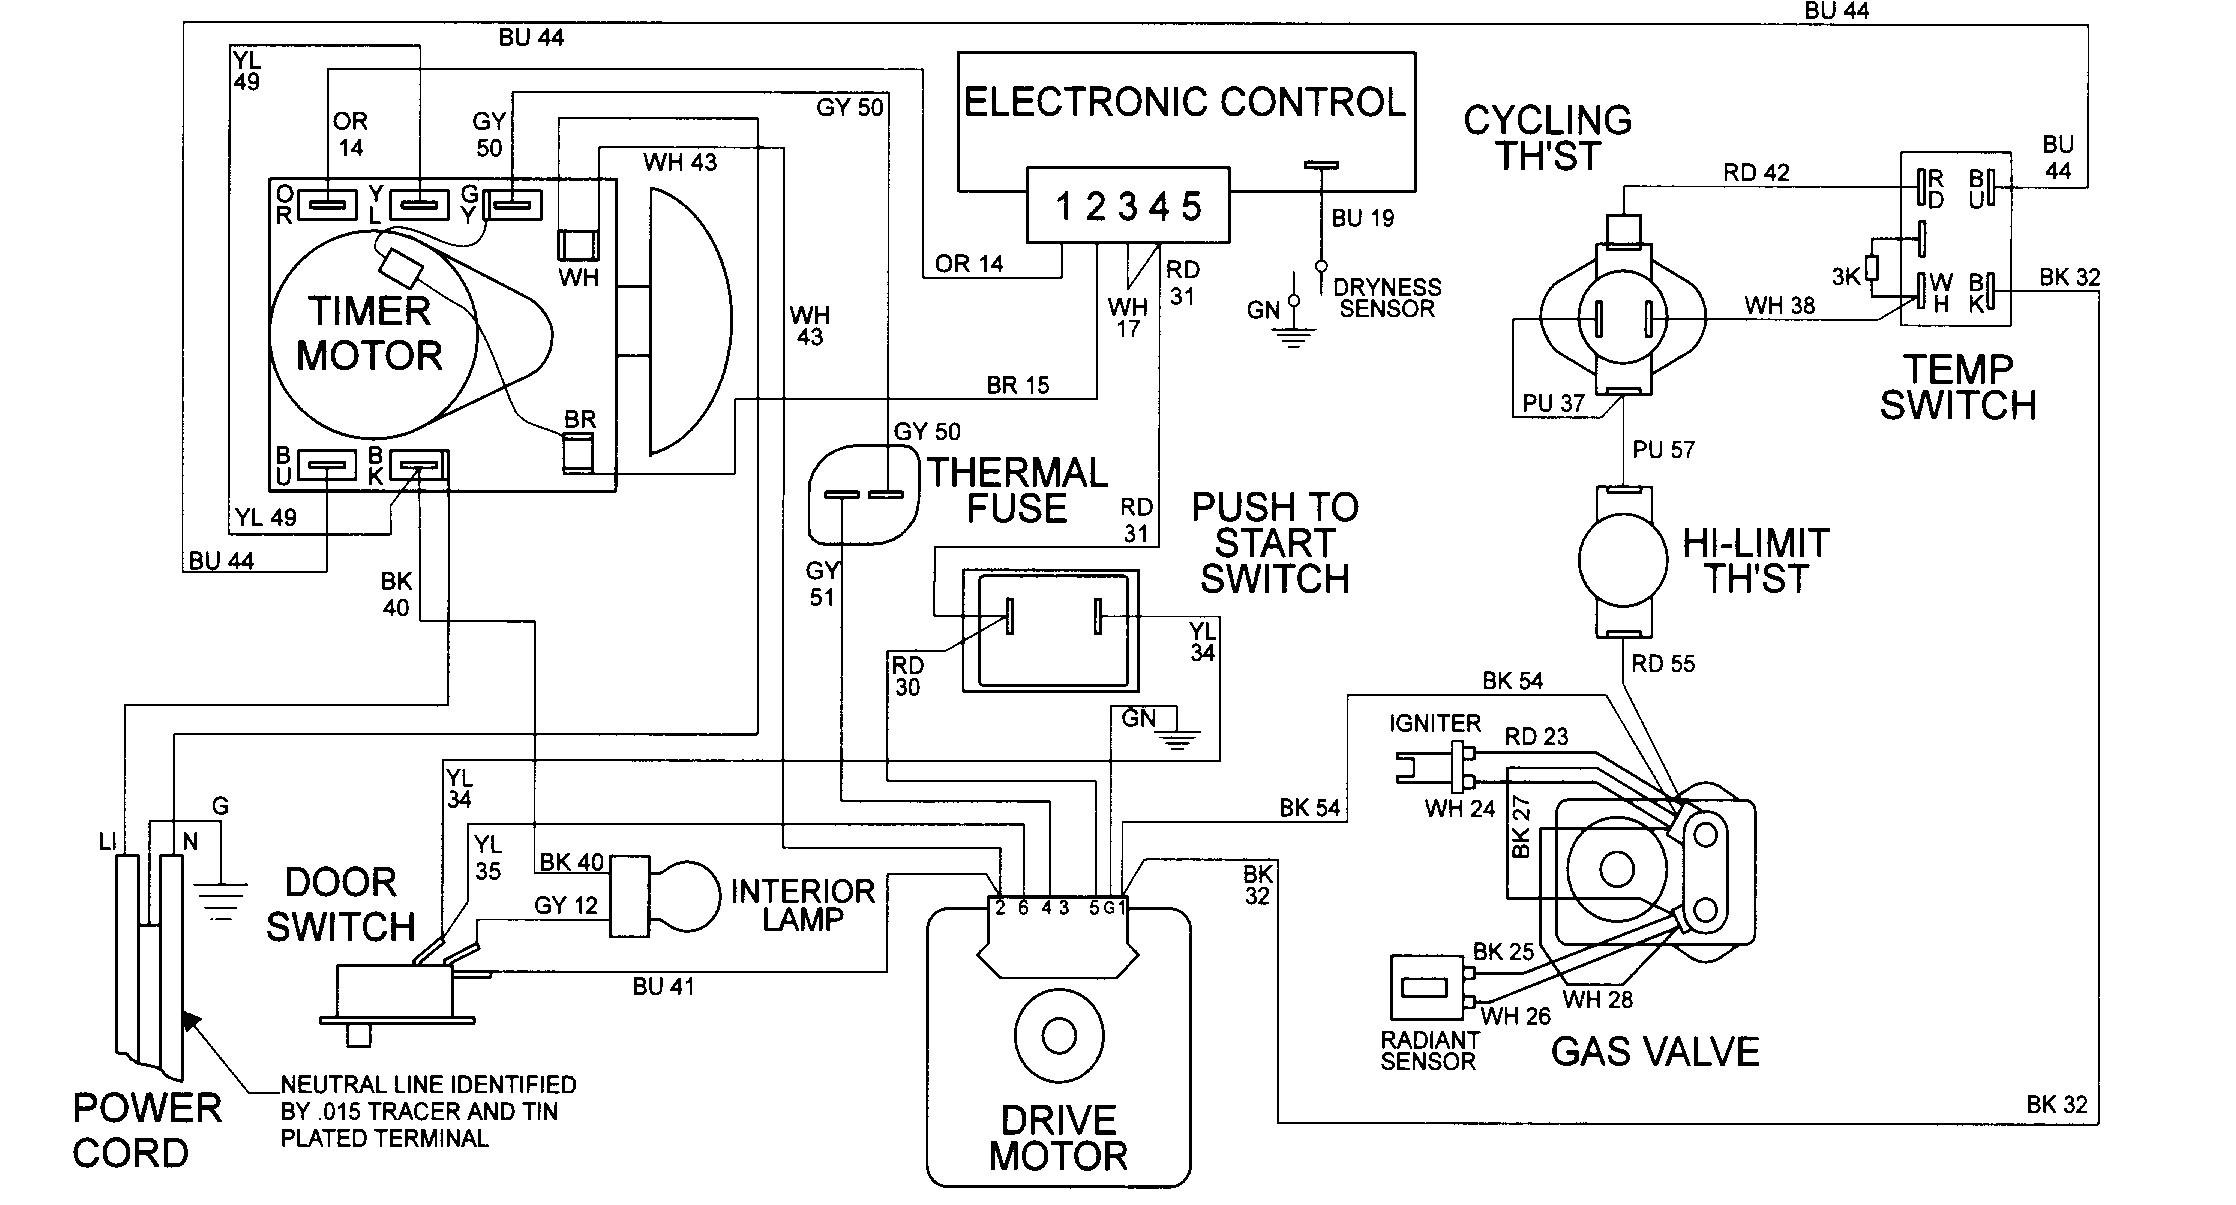 Diagram Wiring Diagram For Power Pack Full Version Hd Quality Power Pack Wiringpros18 Dinosauri Bora It